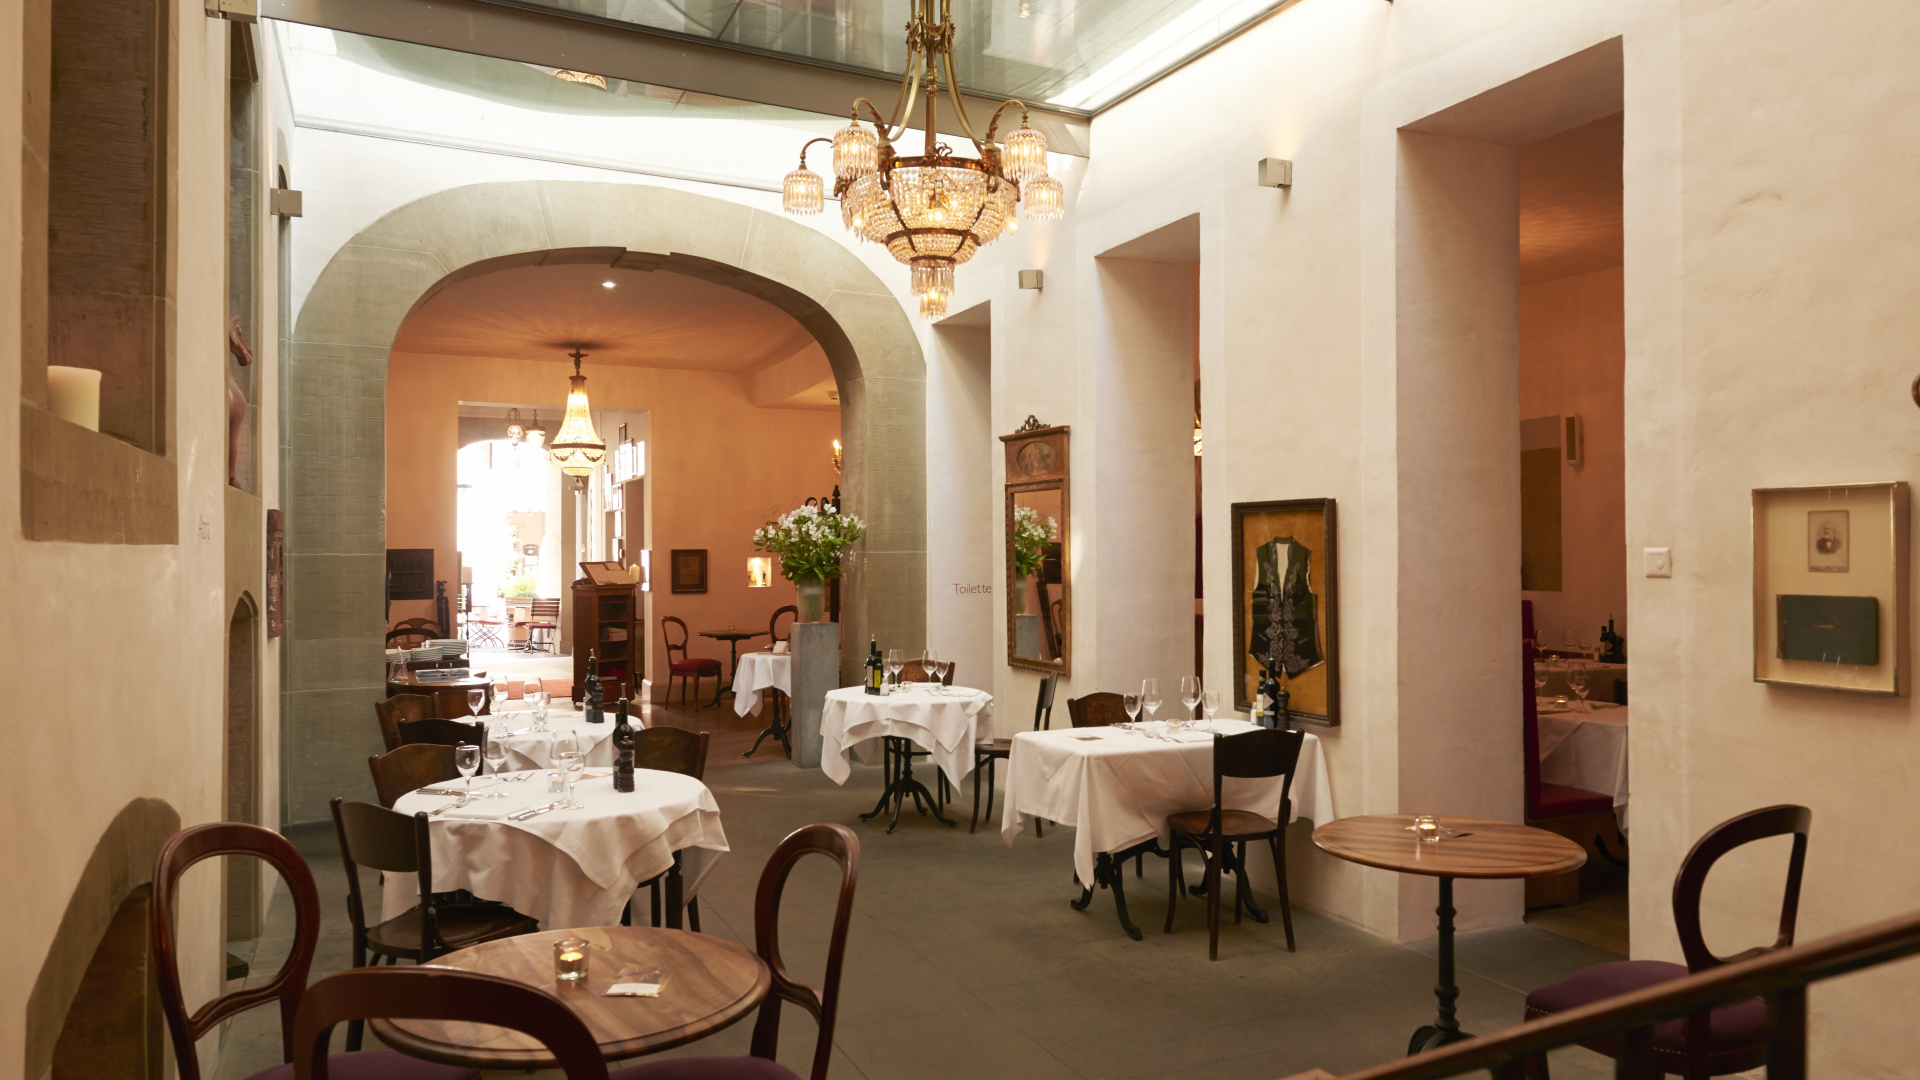 Restaurant Verdi Bern Tourism